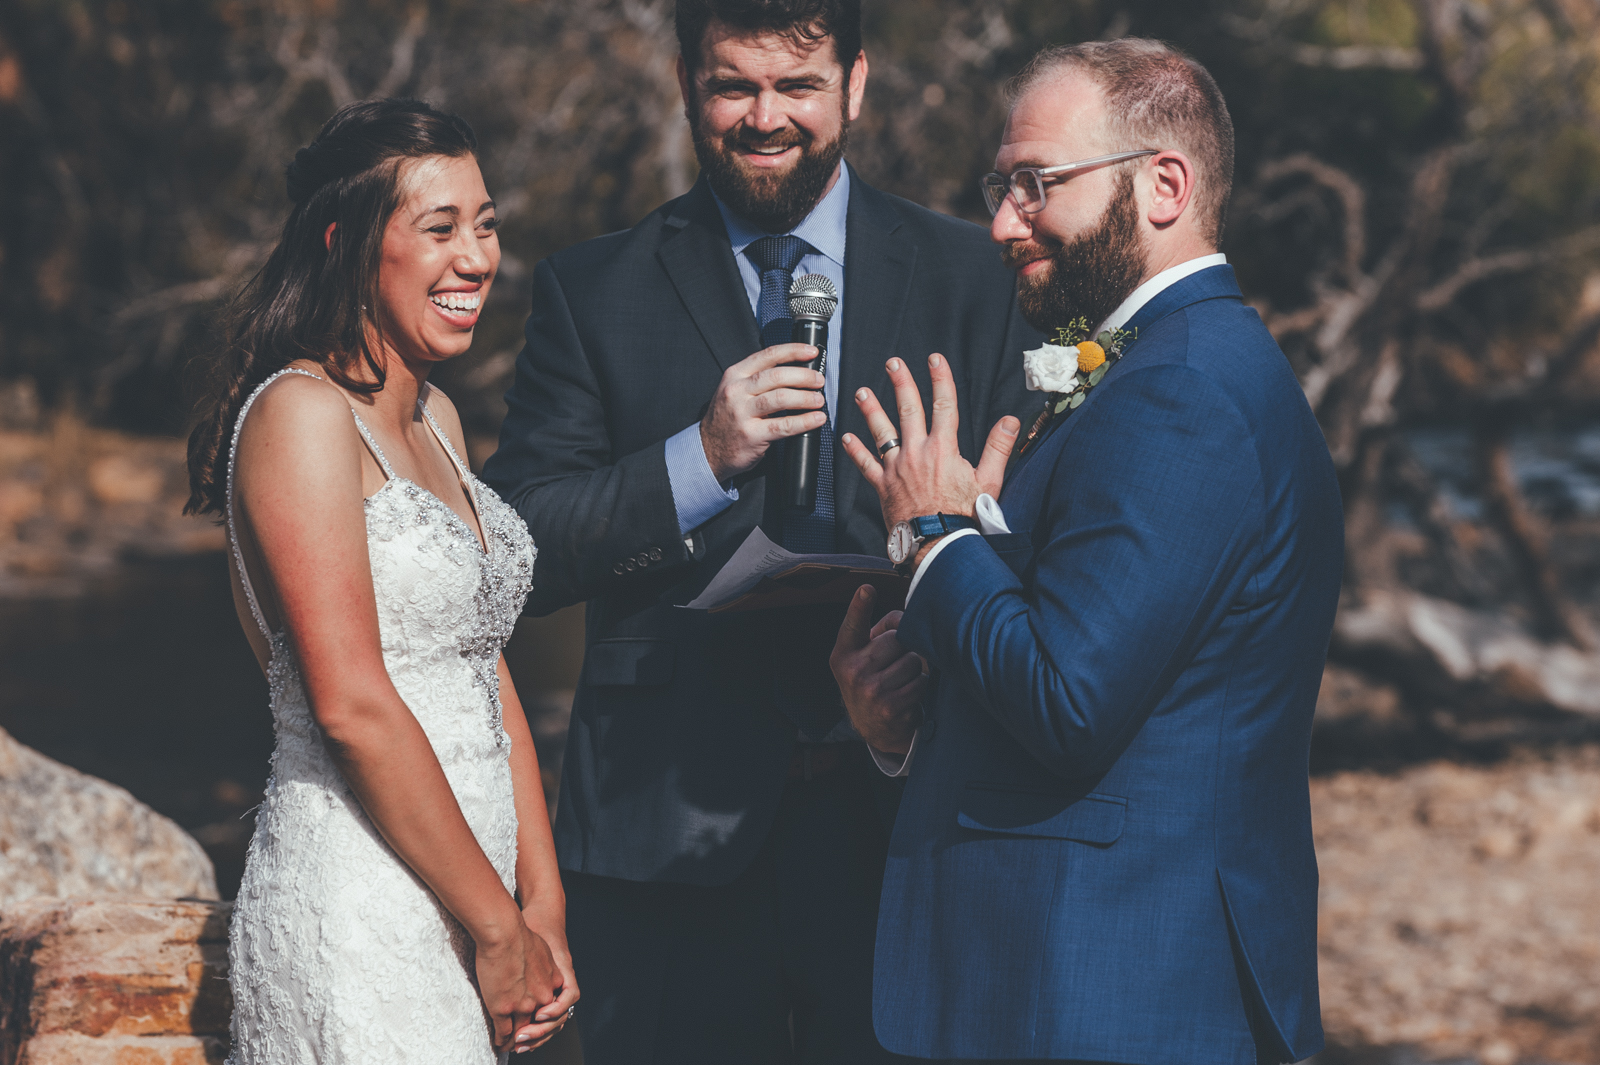 ChadFahnestockPhotography-estes-park-wedding-photography-024.jpg